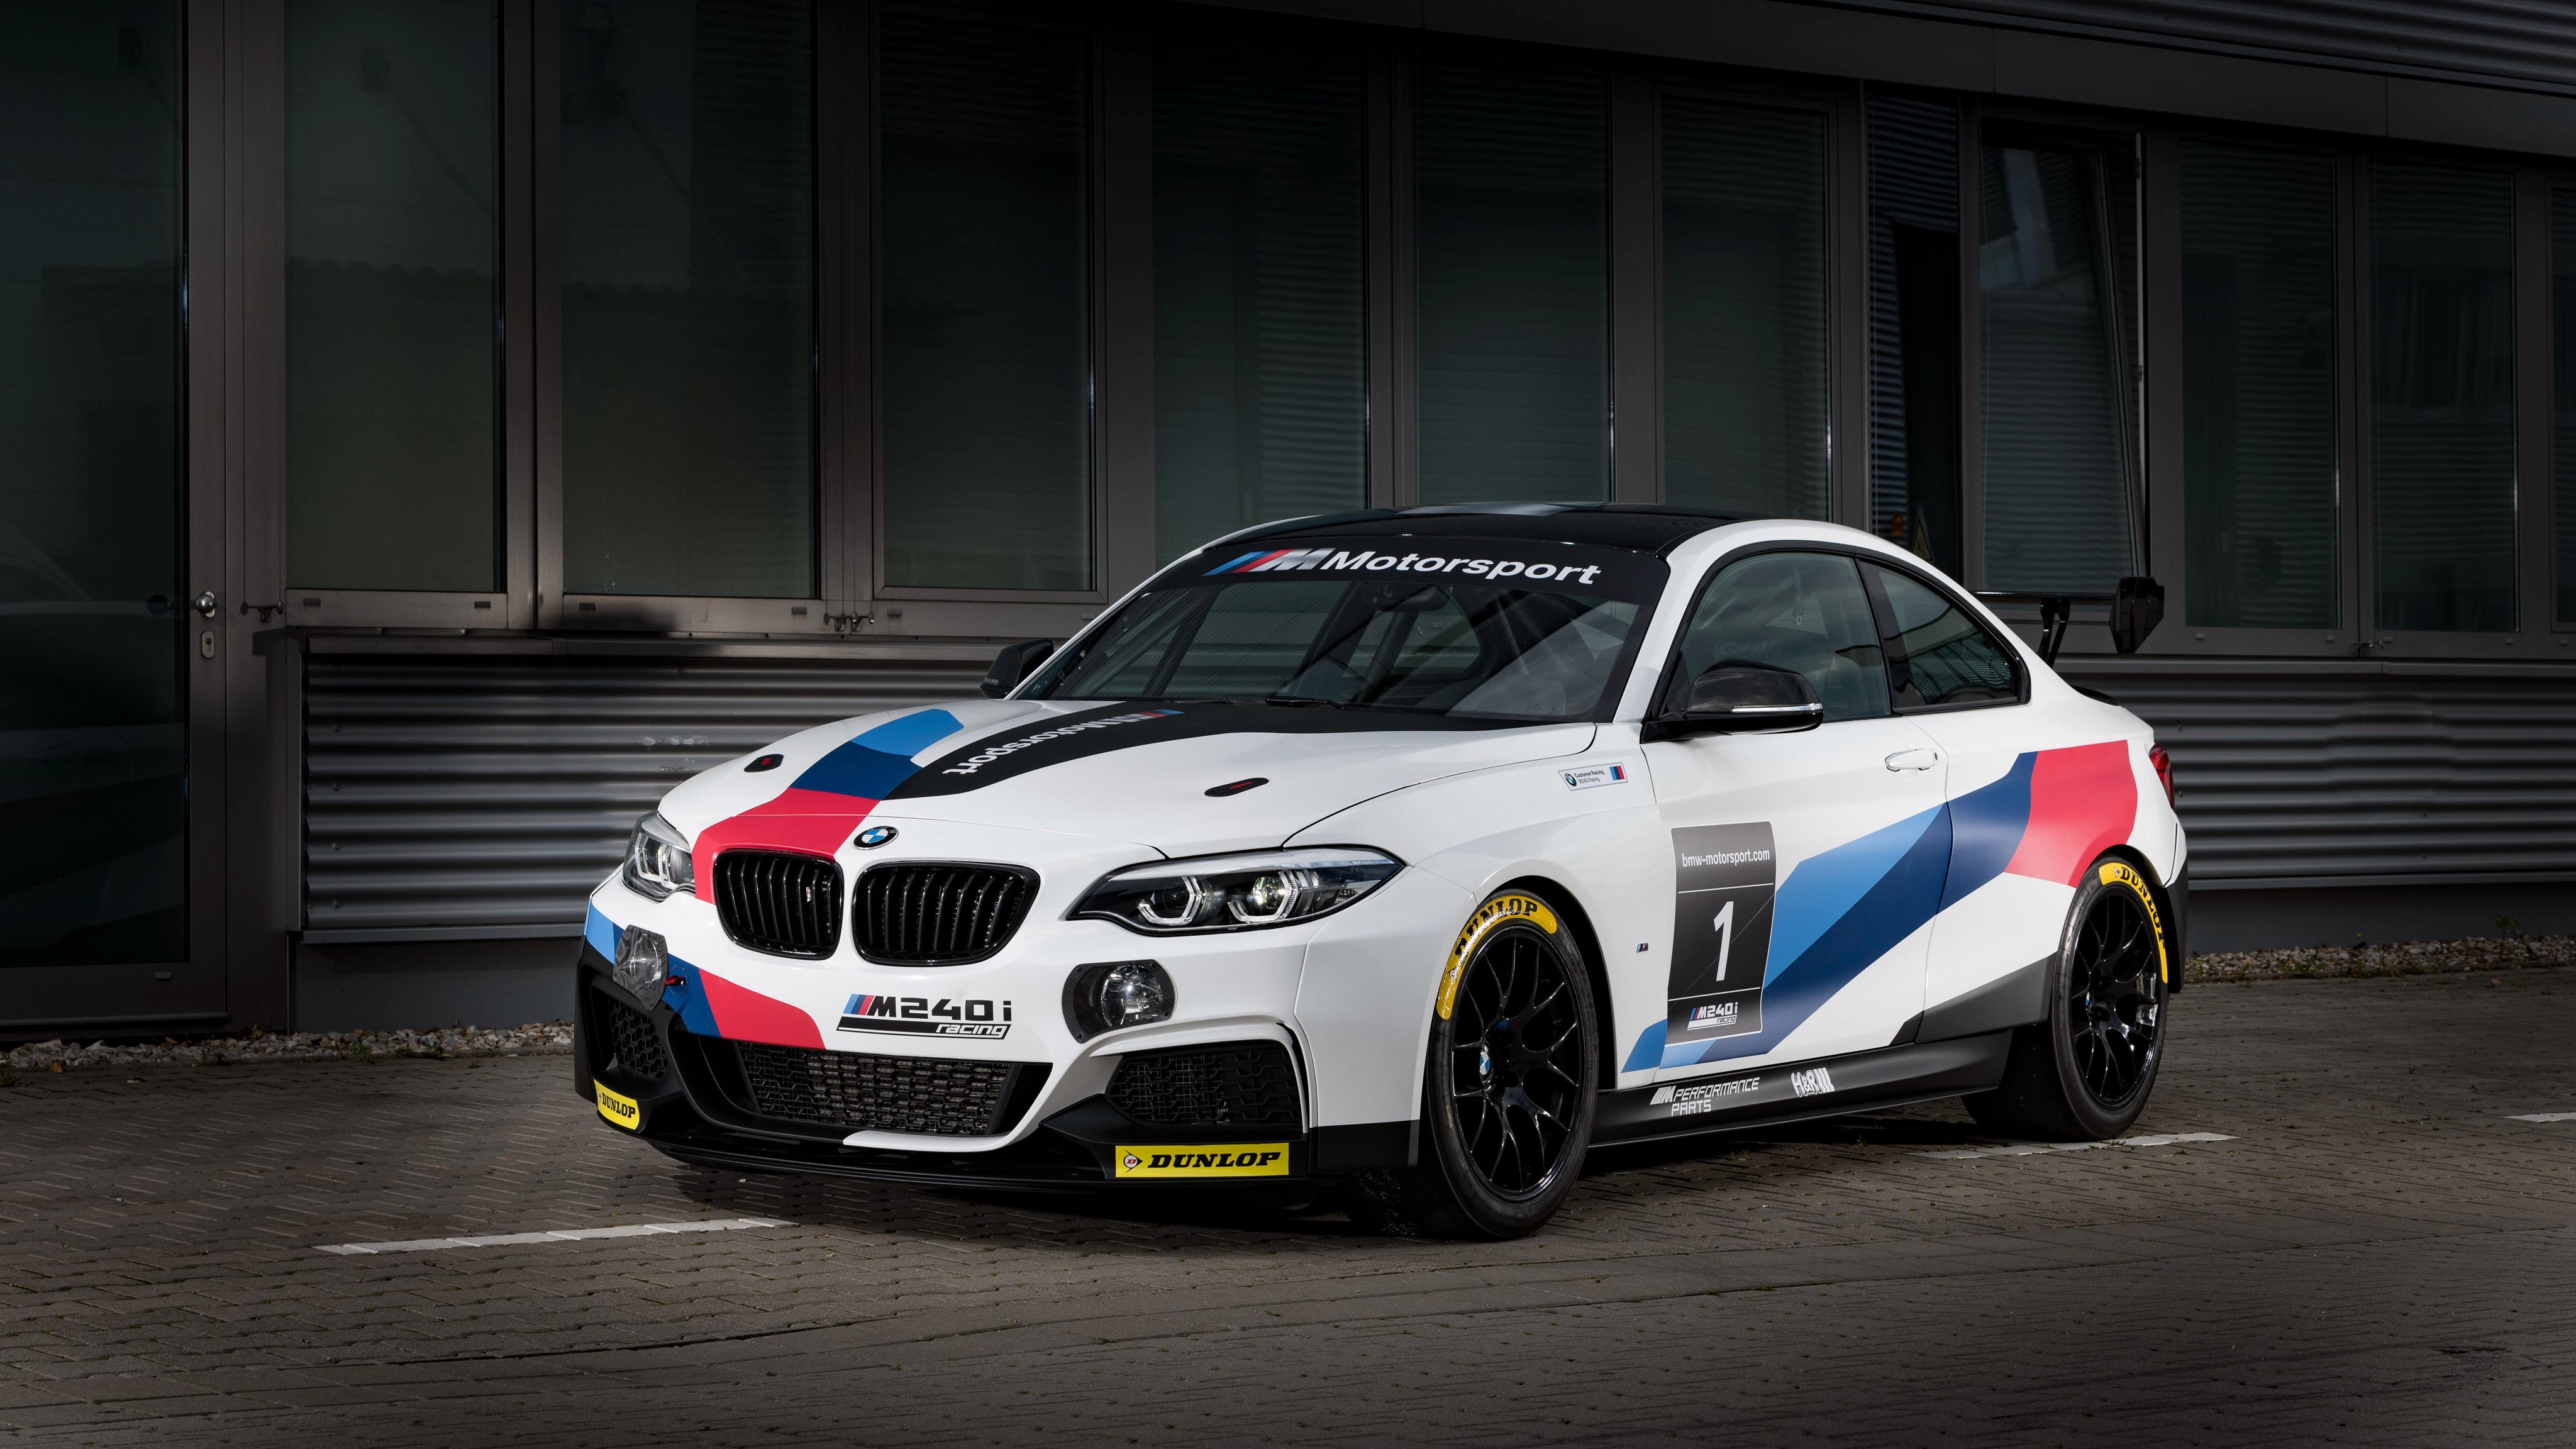 BMW M240i Racing 2018 4K Wallpaper | HD Car Wallpapers ...